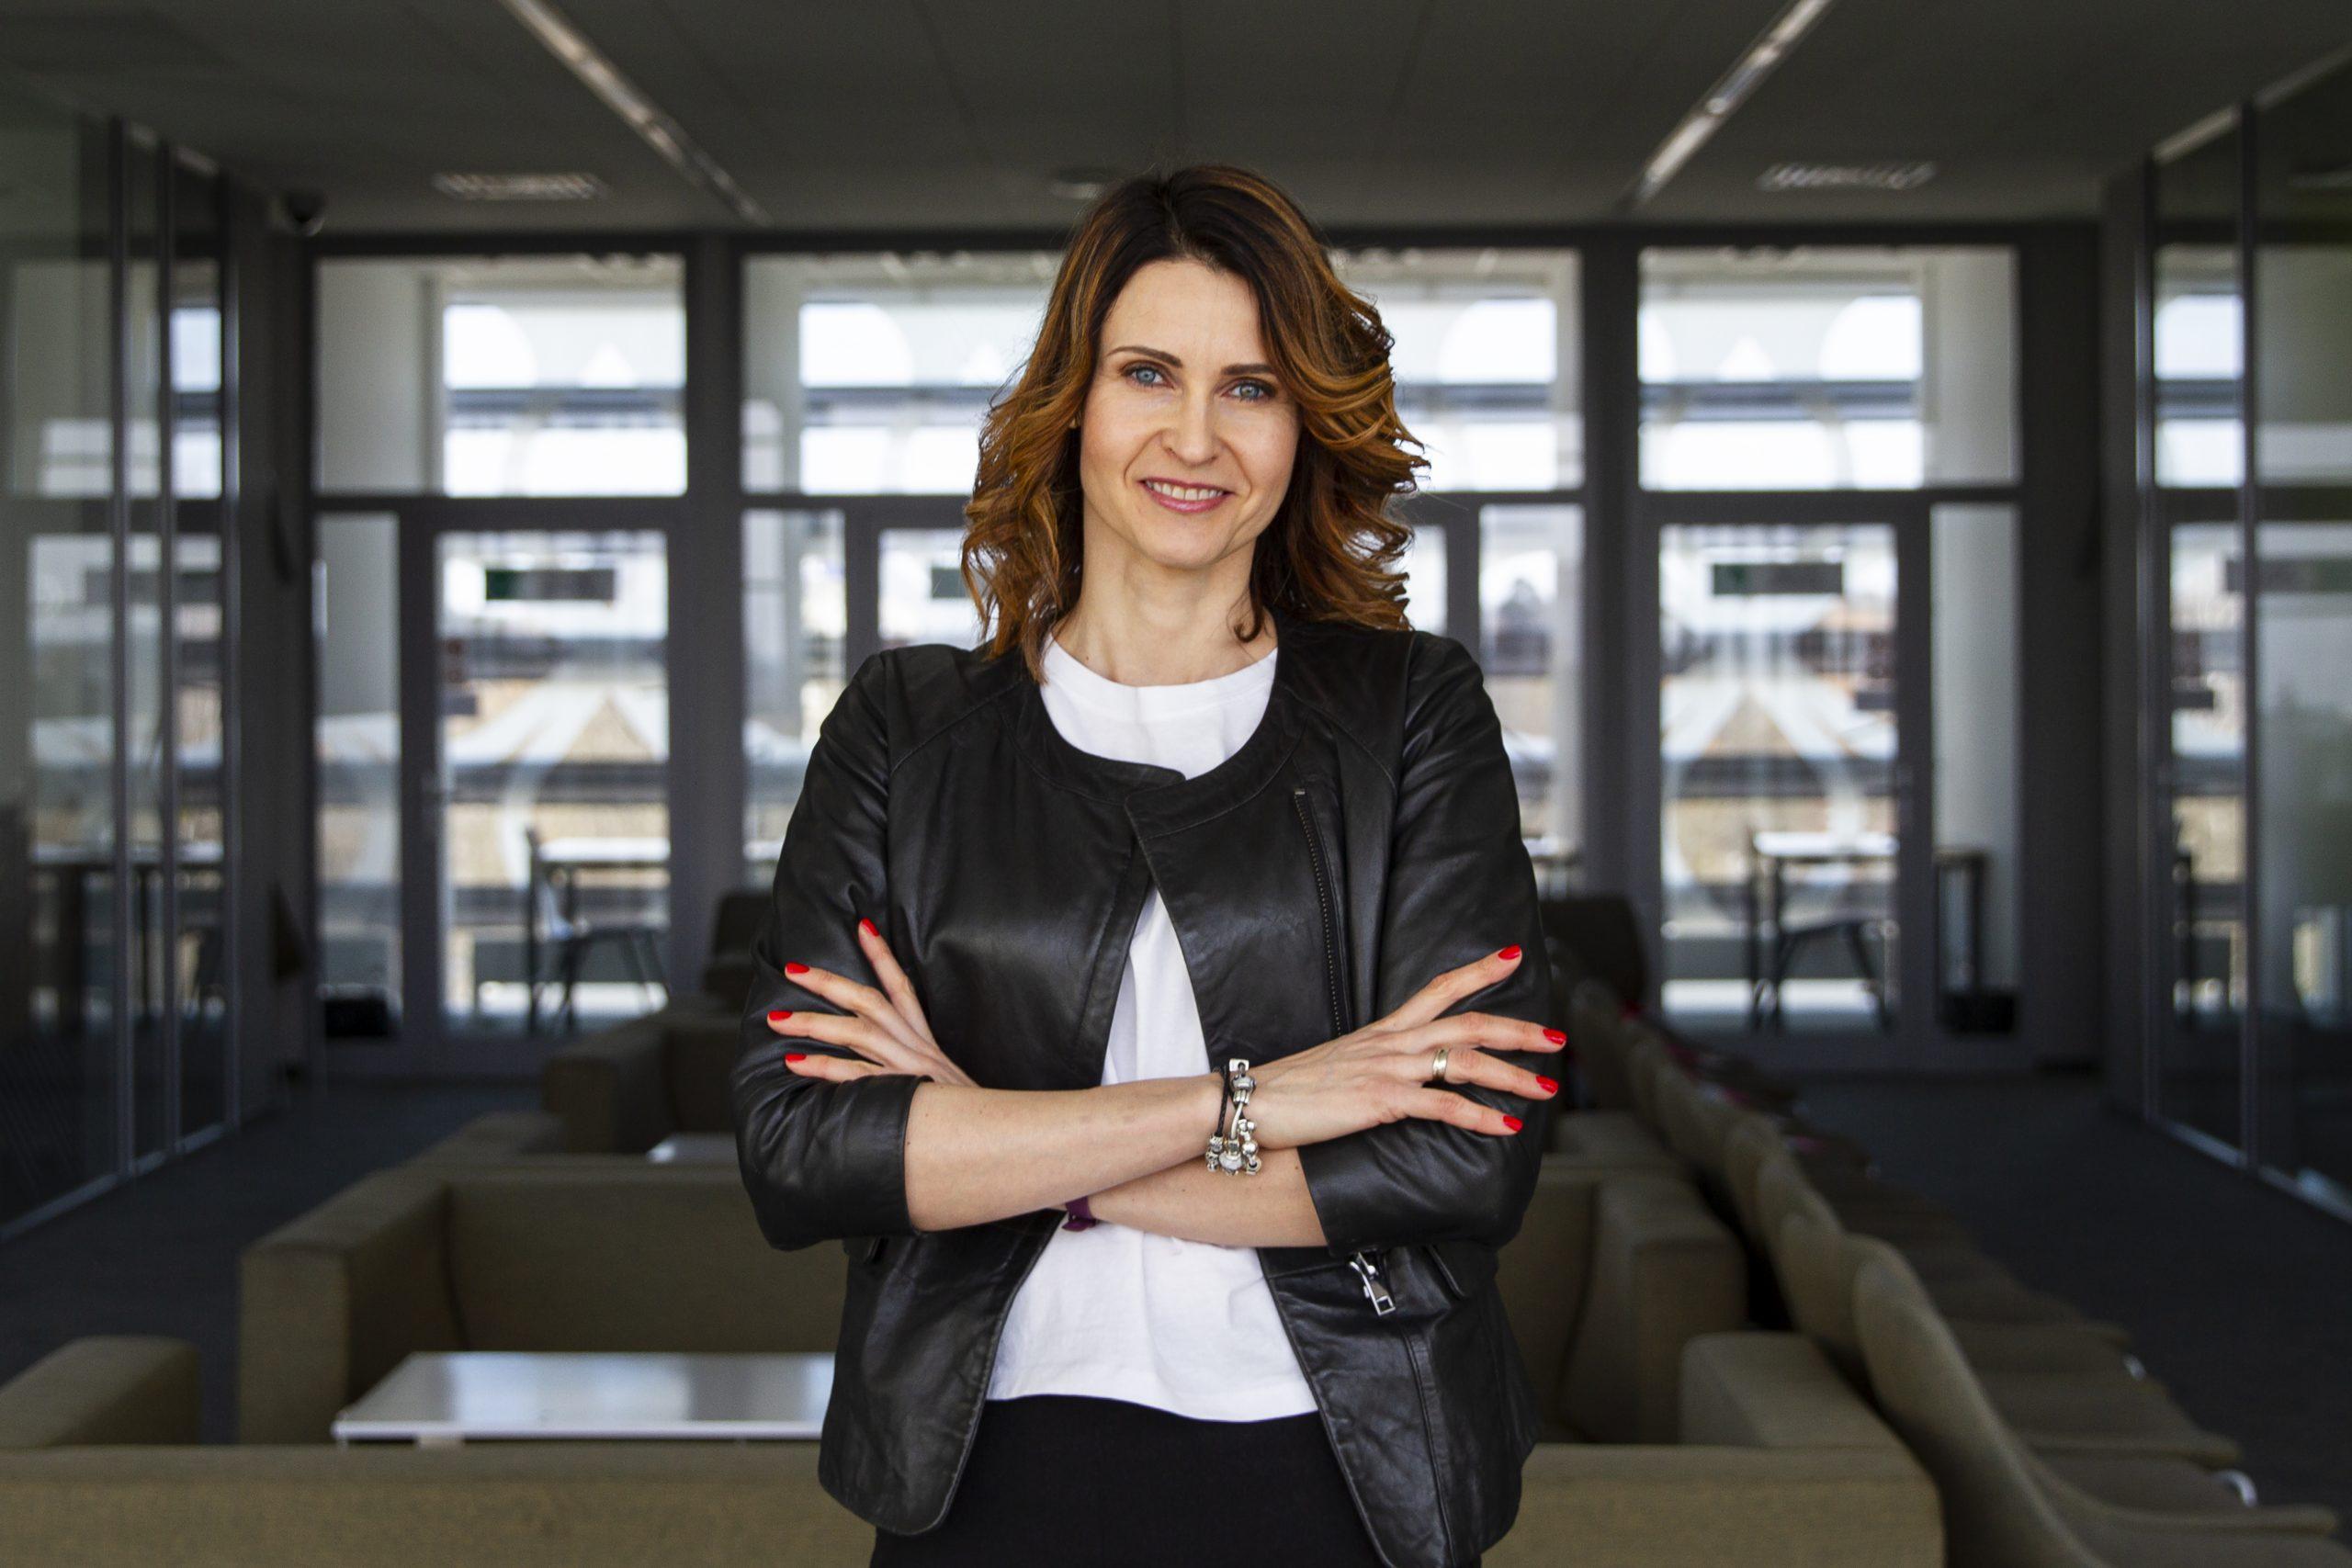 dr hab. Monika Kalinowska, Prof. PB - kierownik Katedry Chemii, Biologii i Biotechnologii